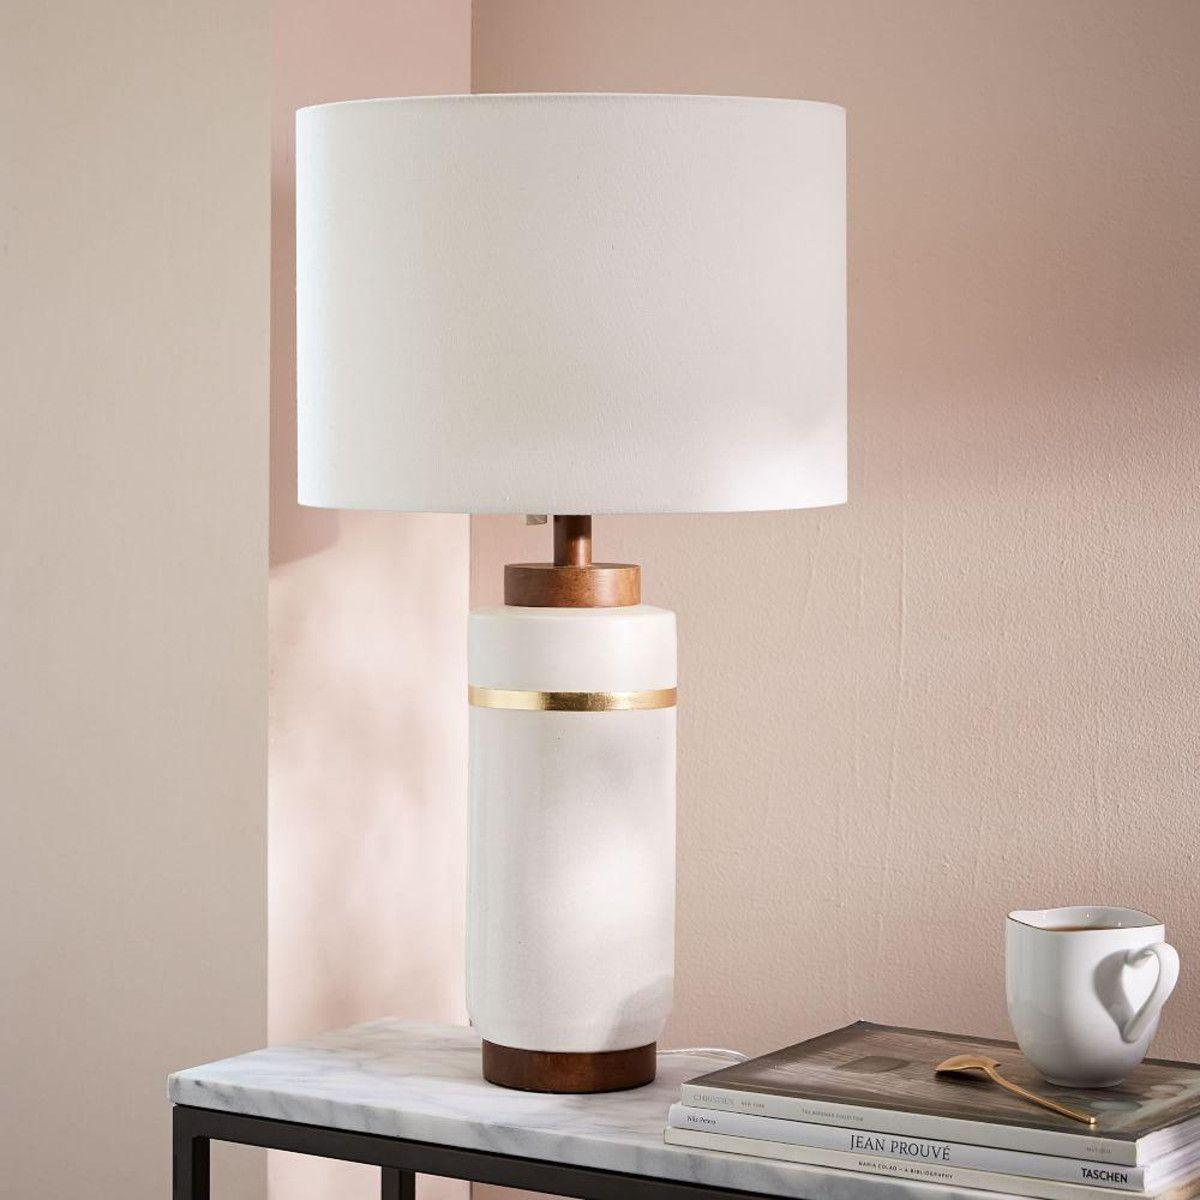 Roar Rabbit Crackle Glaze Ceramic Table Lamp Large West Elm